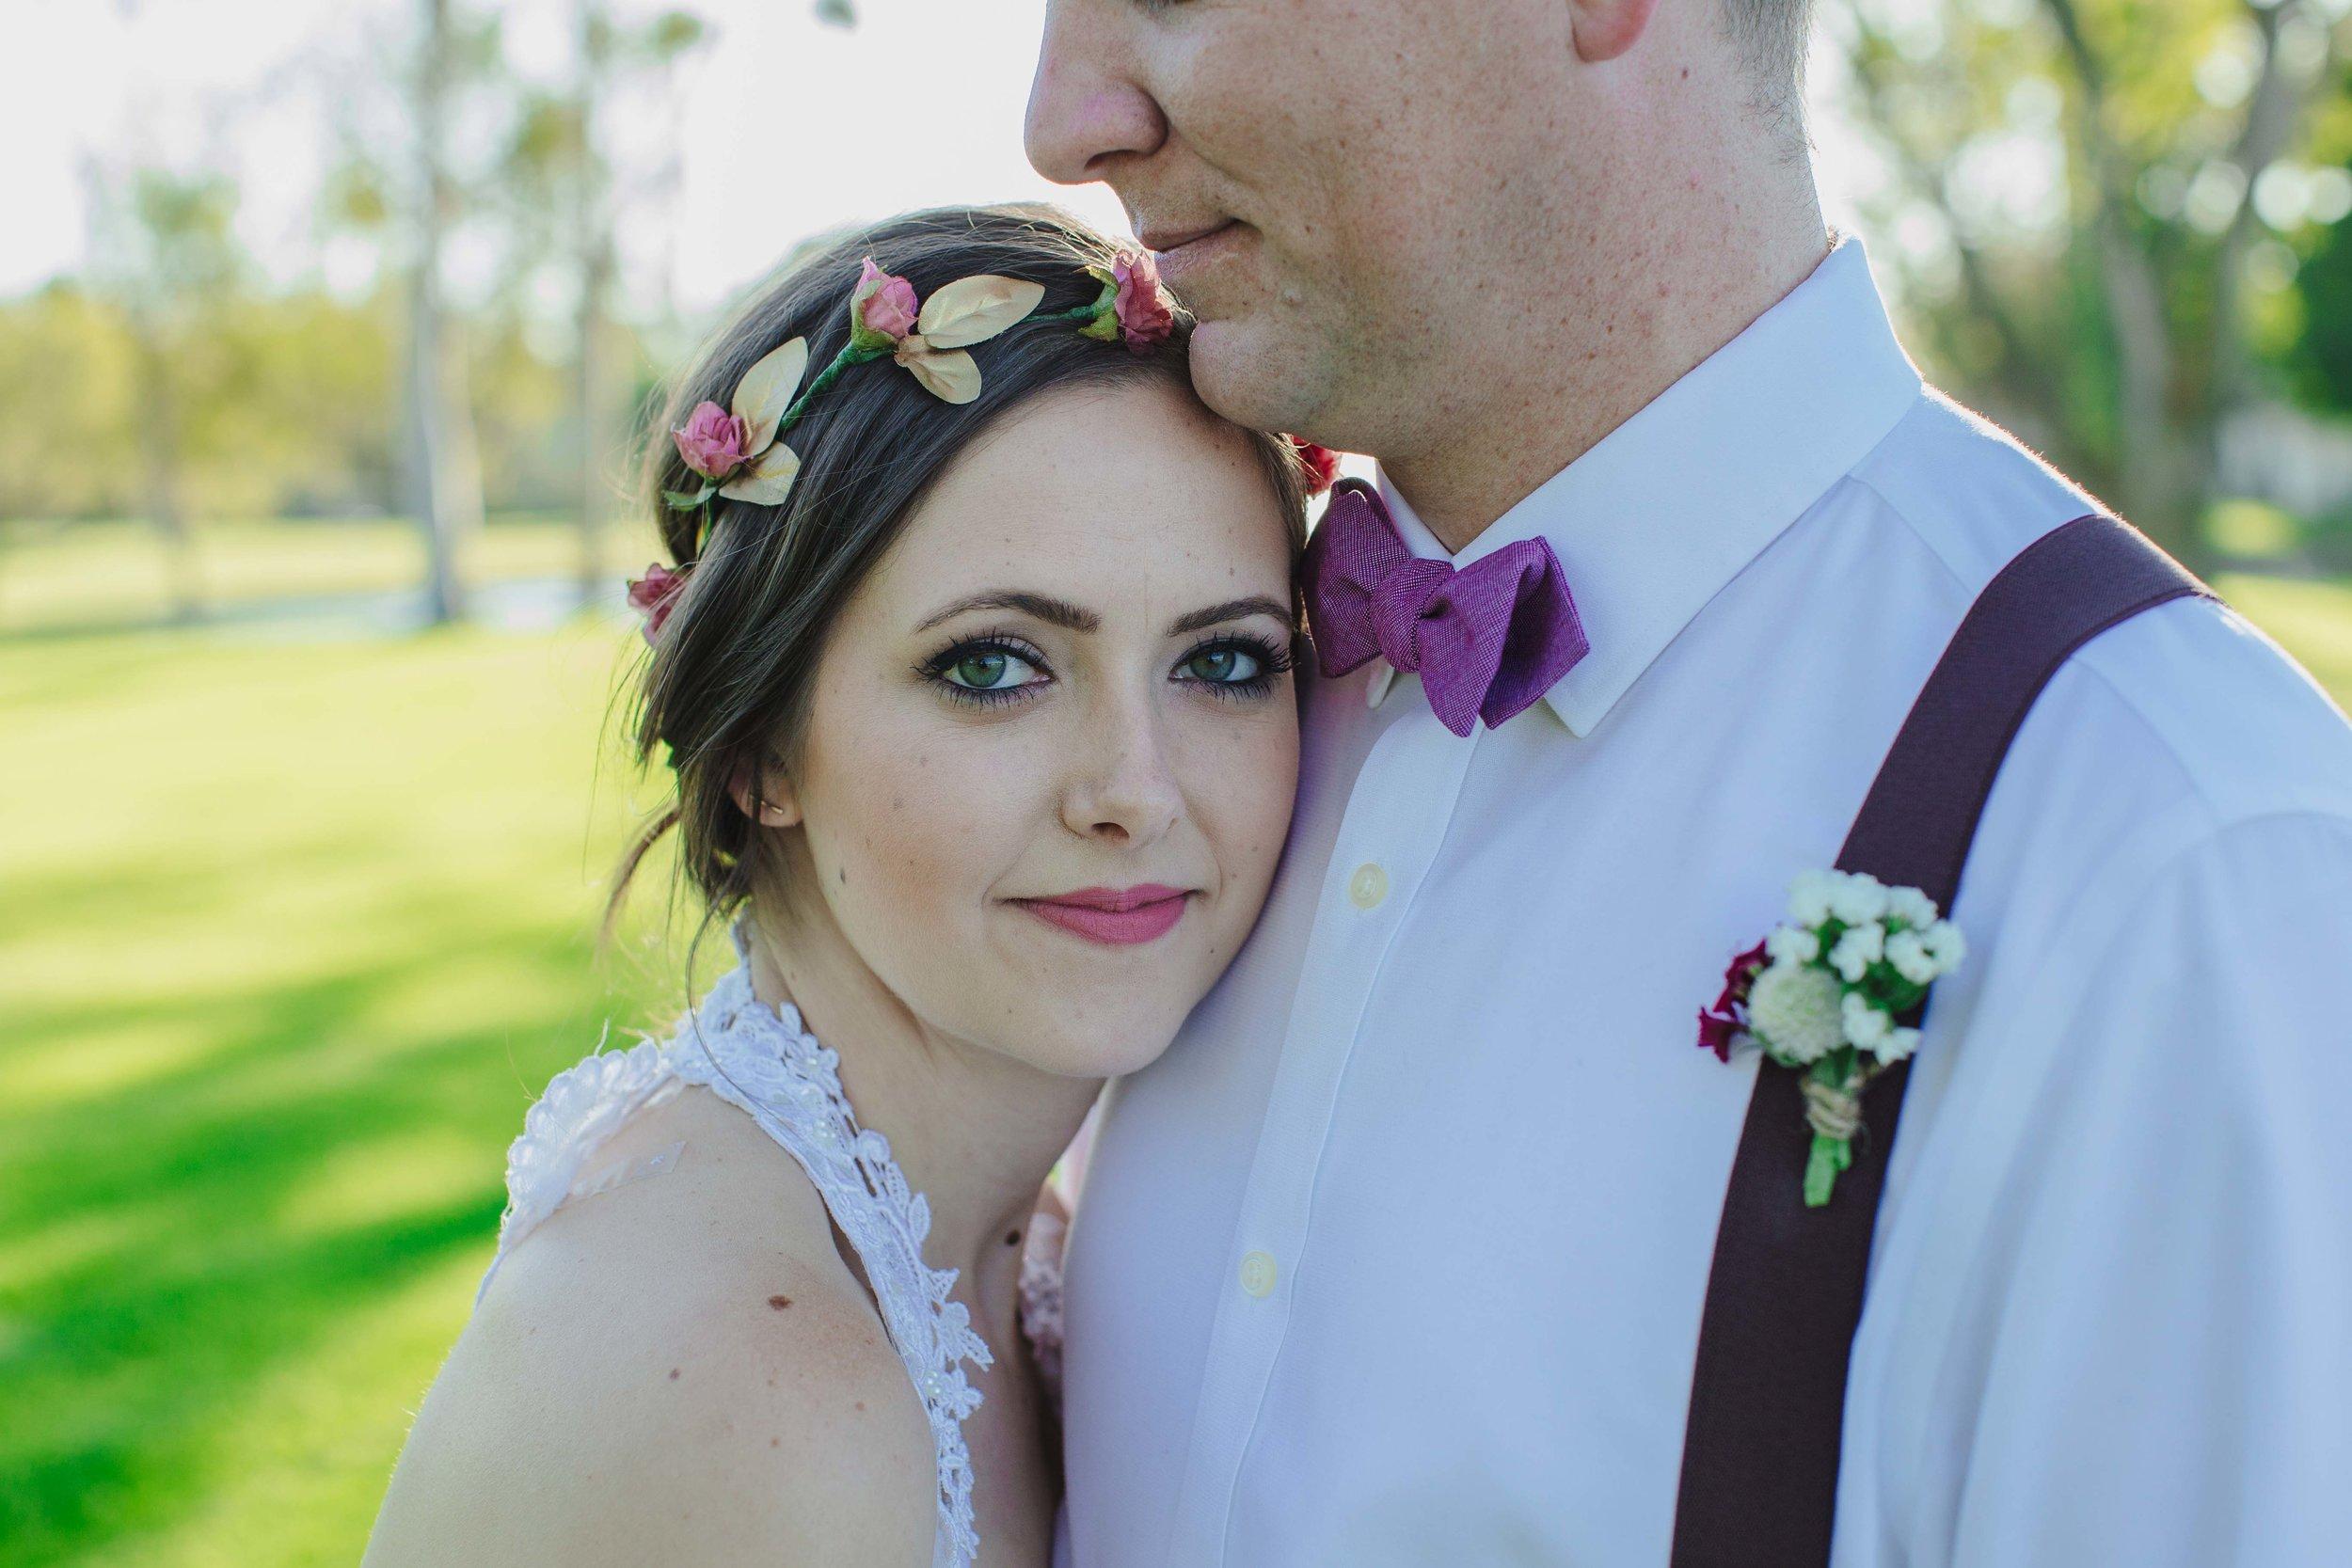 20141024-DePartee-Wedding-APavone-038-sm.jpg